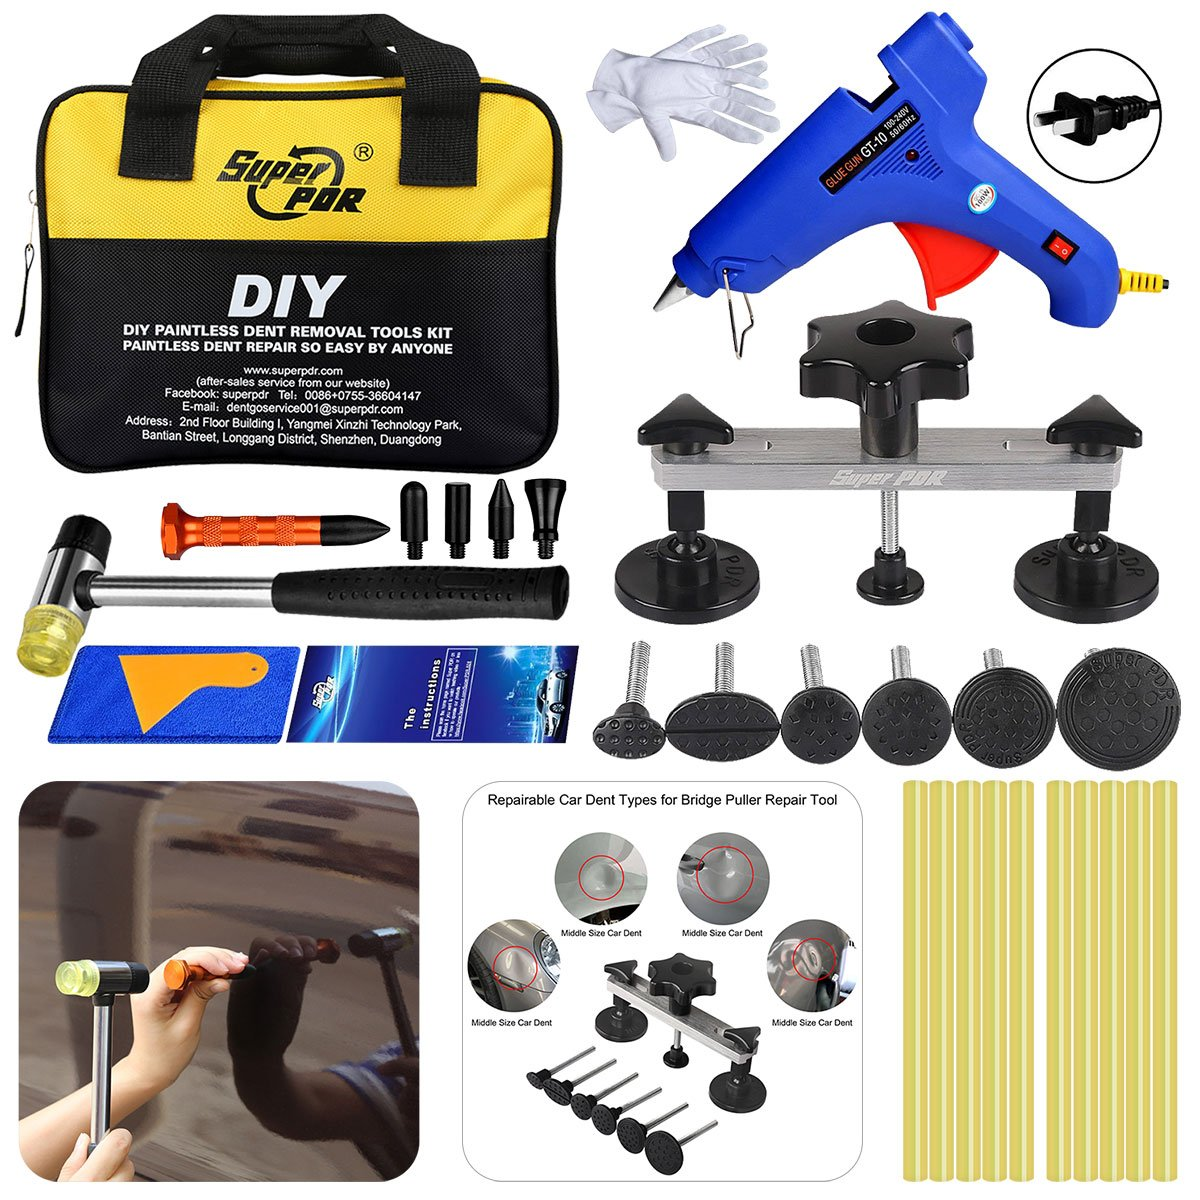 Super PDR 28Pcs Bridge Puller Kits Car auto Body Dent Removal Repair Tool Kit Tool Bag